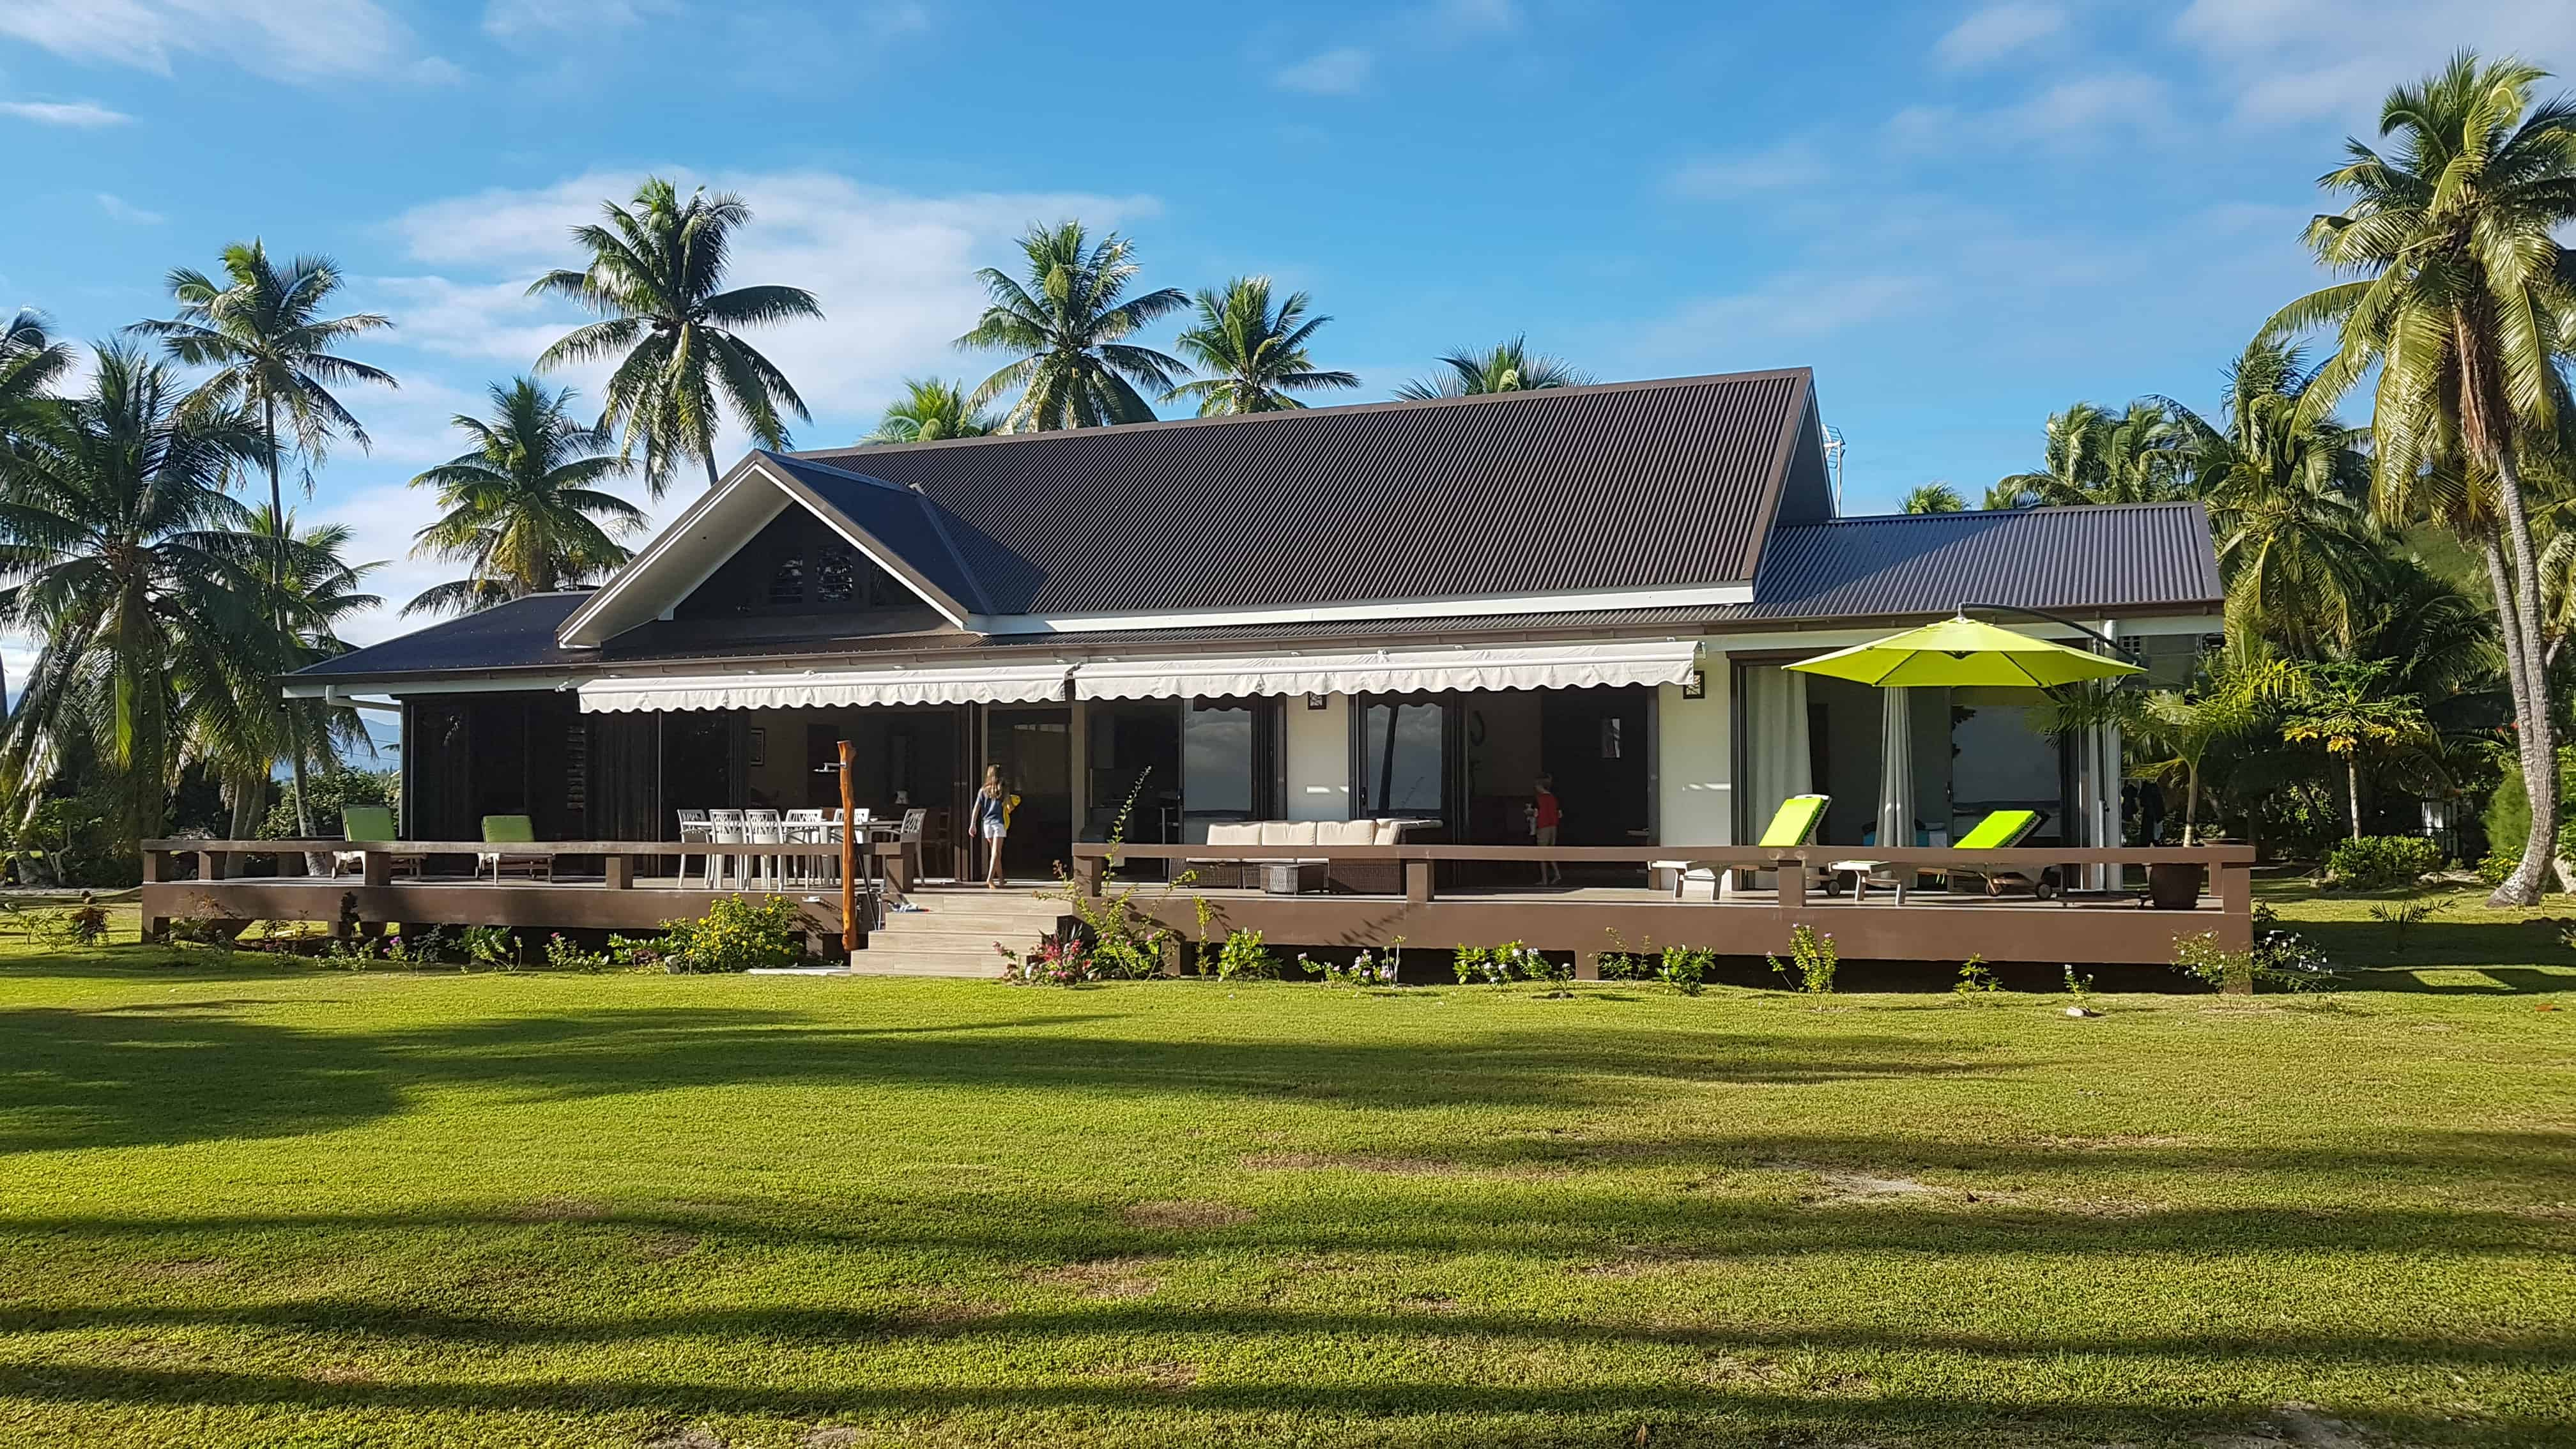 https://tahititourisme.com.br/wp-content/uploads/2018/09/Villa-Tiarenui-by-Tahiti-Homes-®-a-Moorea-4.jpg